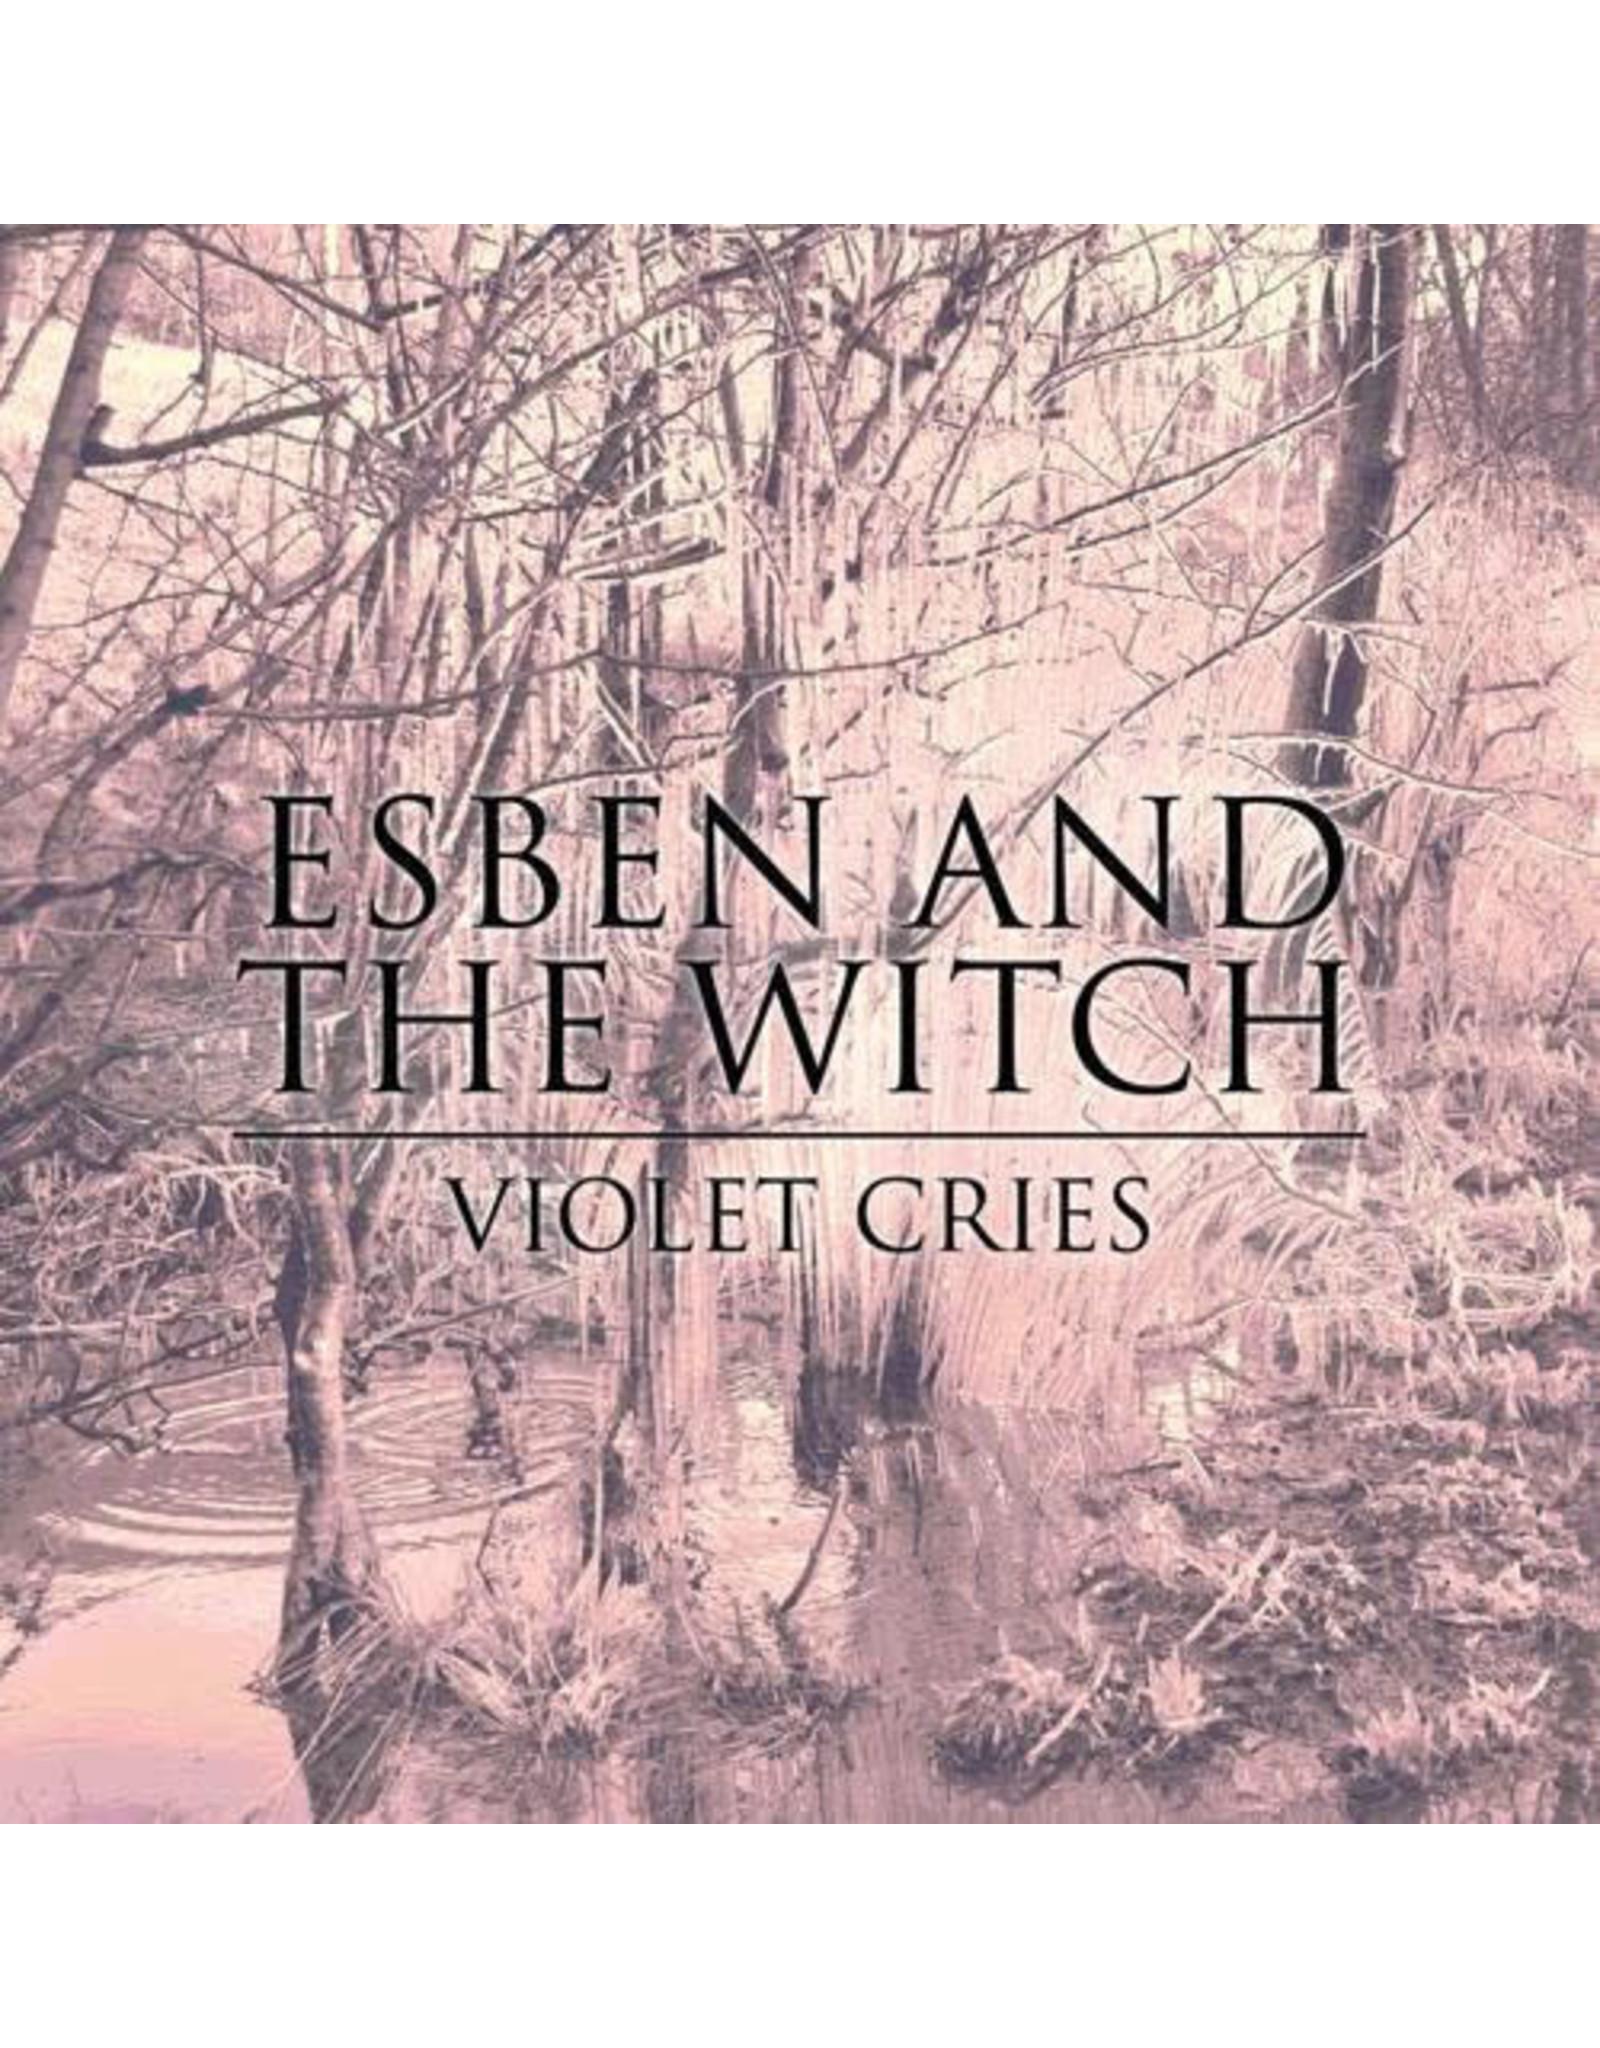 Esben & The Witch - Violet Crisis CD